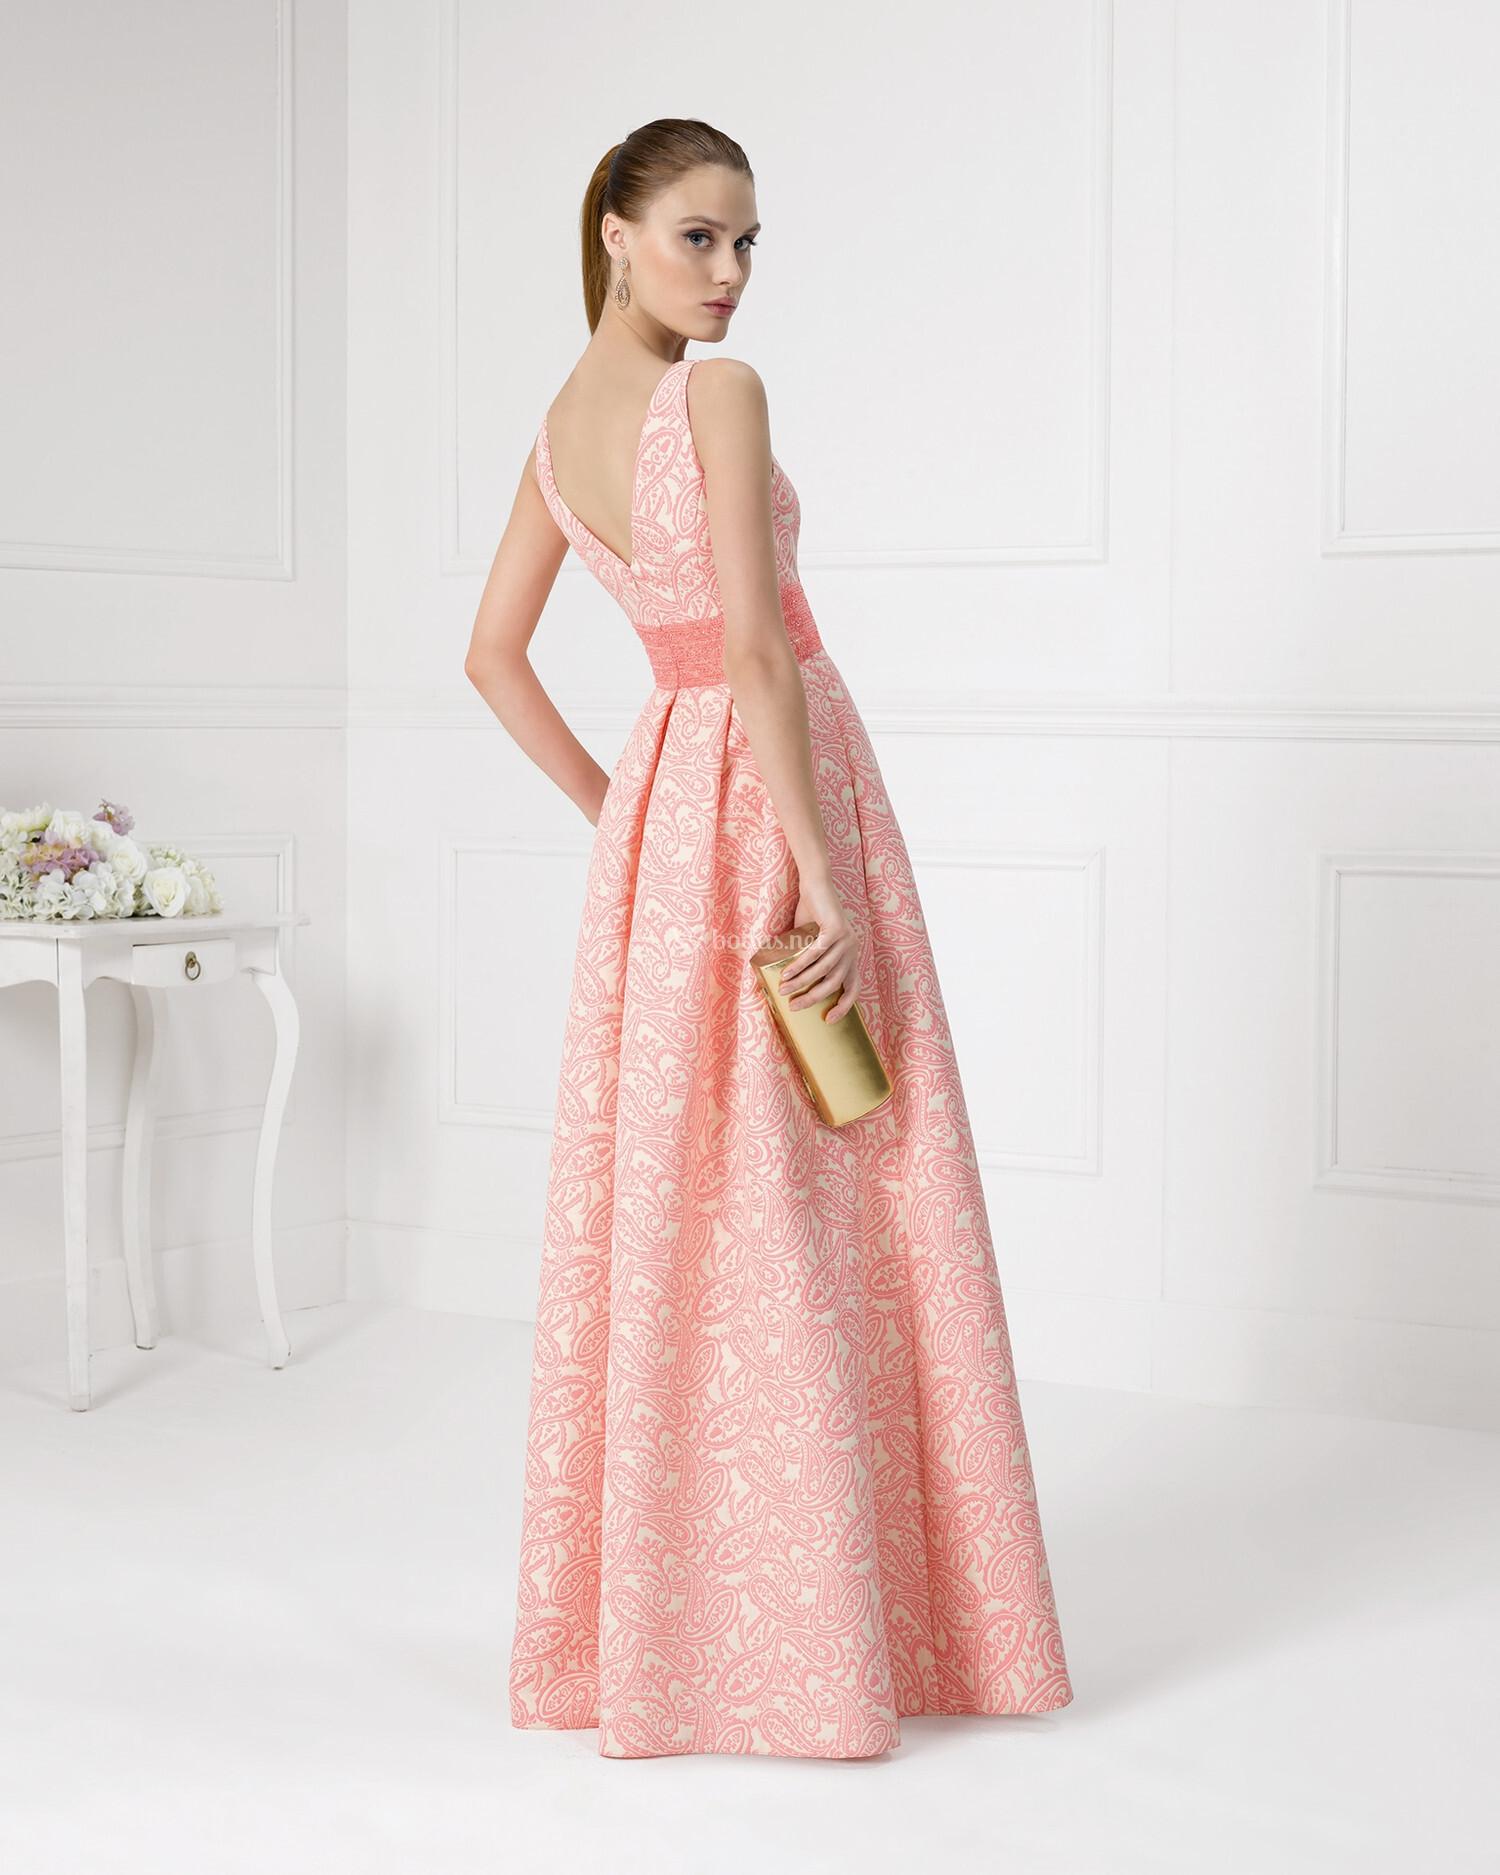 Asombroso Vestidos De Novia De Tulsa Colección - Colección de ...